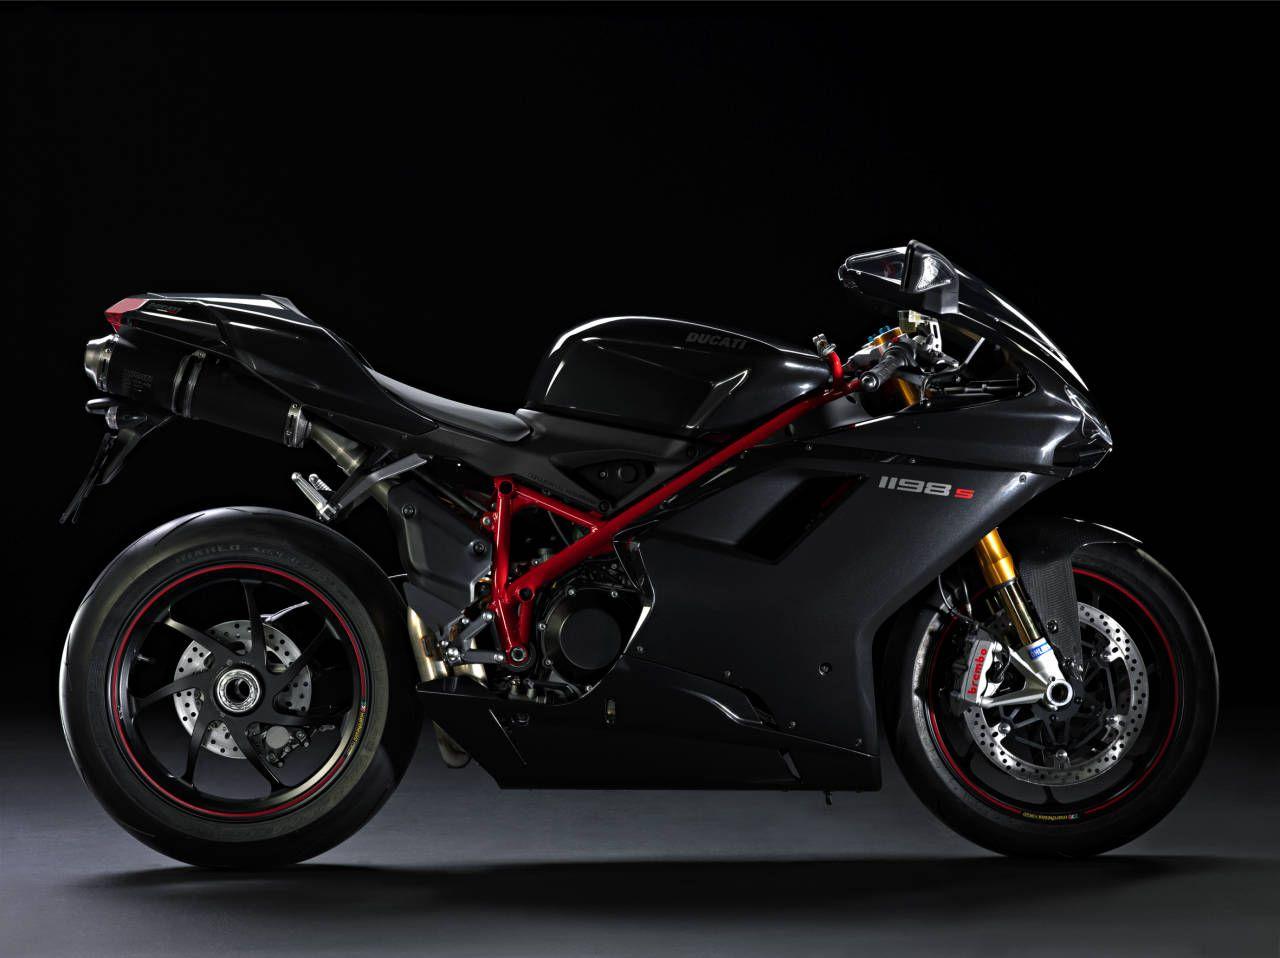 2010 Ducati Buyer's Guide | Motorcycles | Pinterest | Ducati ...